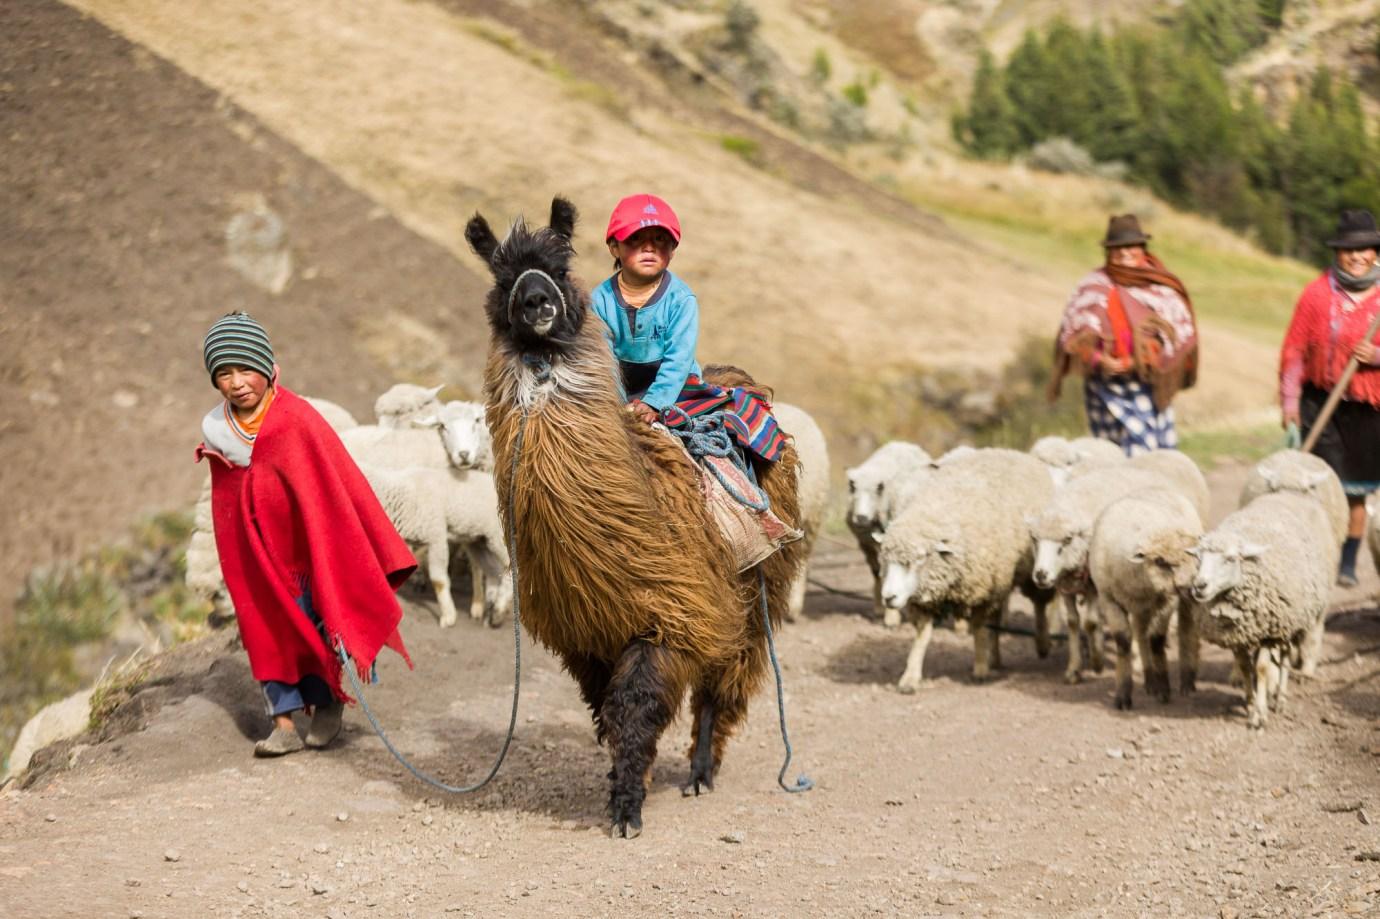 Joel (4) rides a llama through a village in Cotopaxi Province, Ecuador.